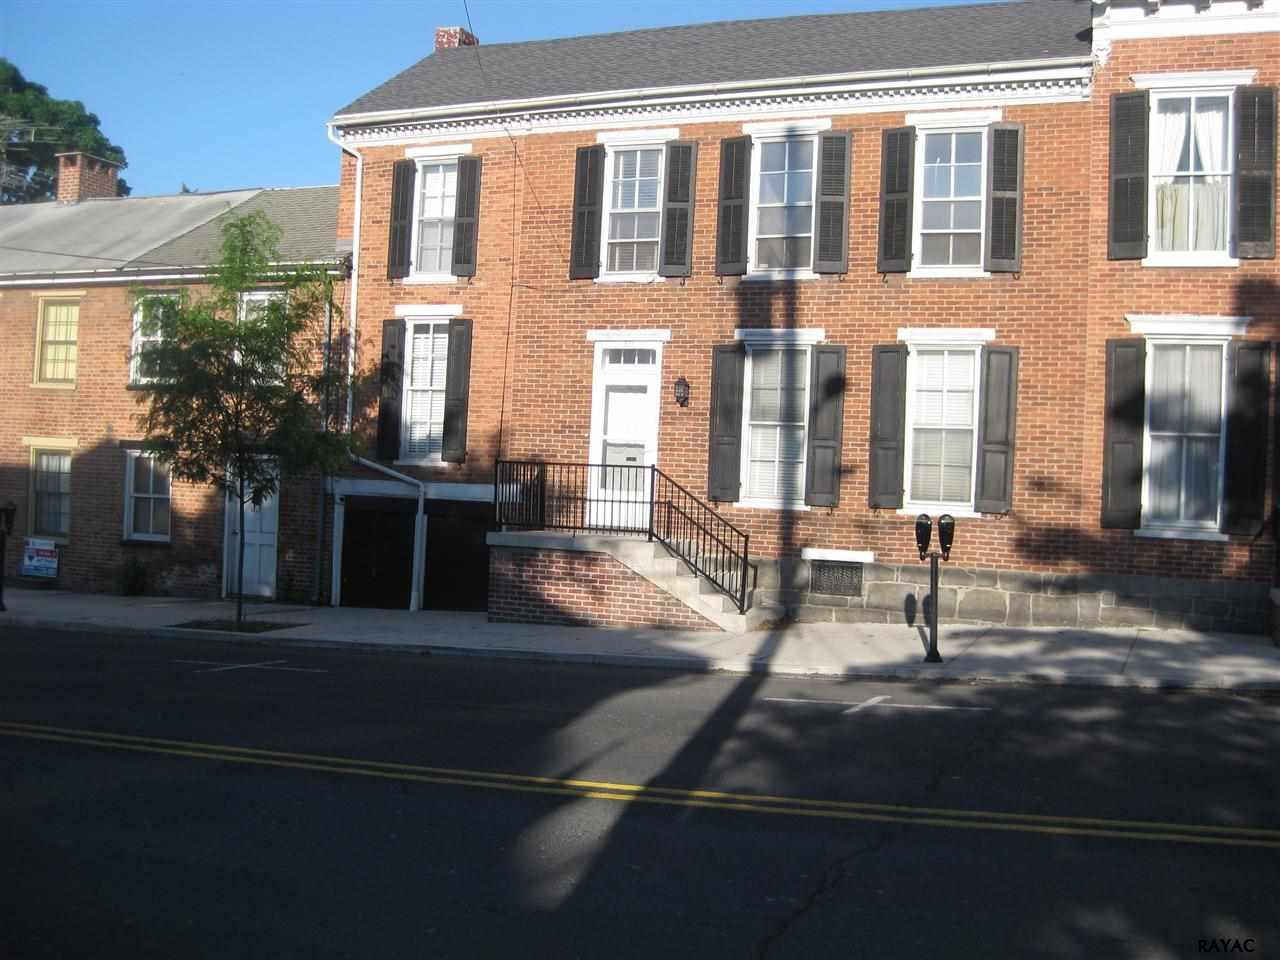 317 Baltimore St, Gettysburg, PA 17325